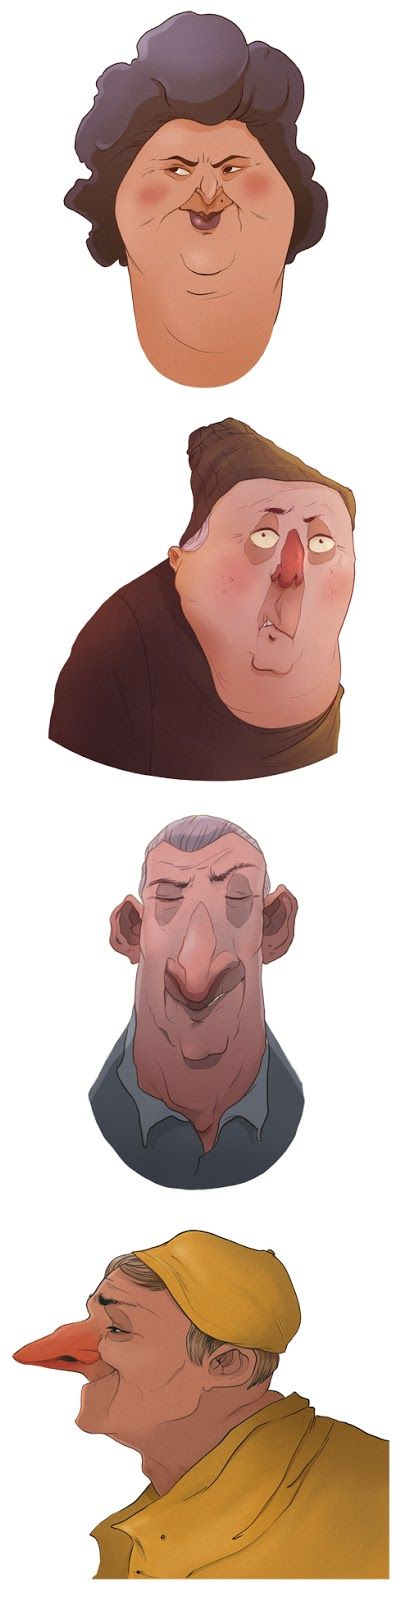 Faces - Character design https://www.facebook.com/CharacterDesignReferences